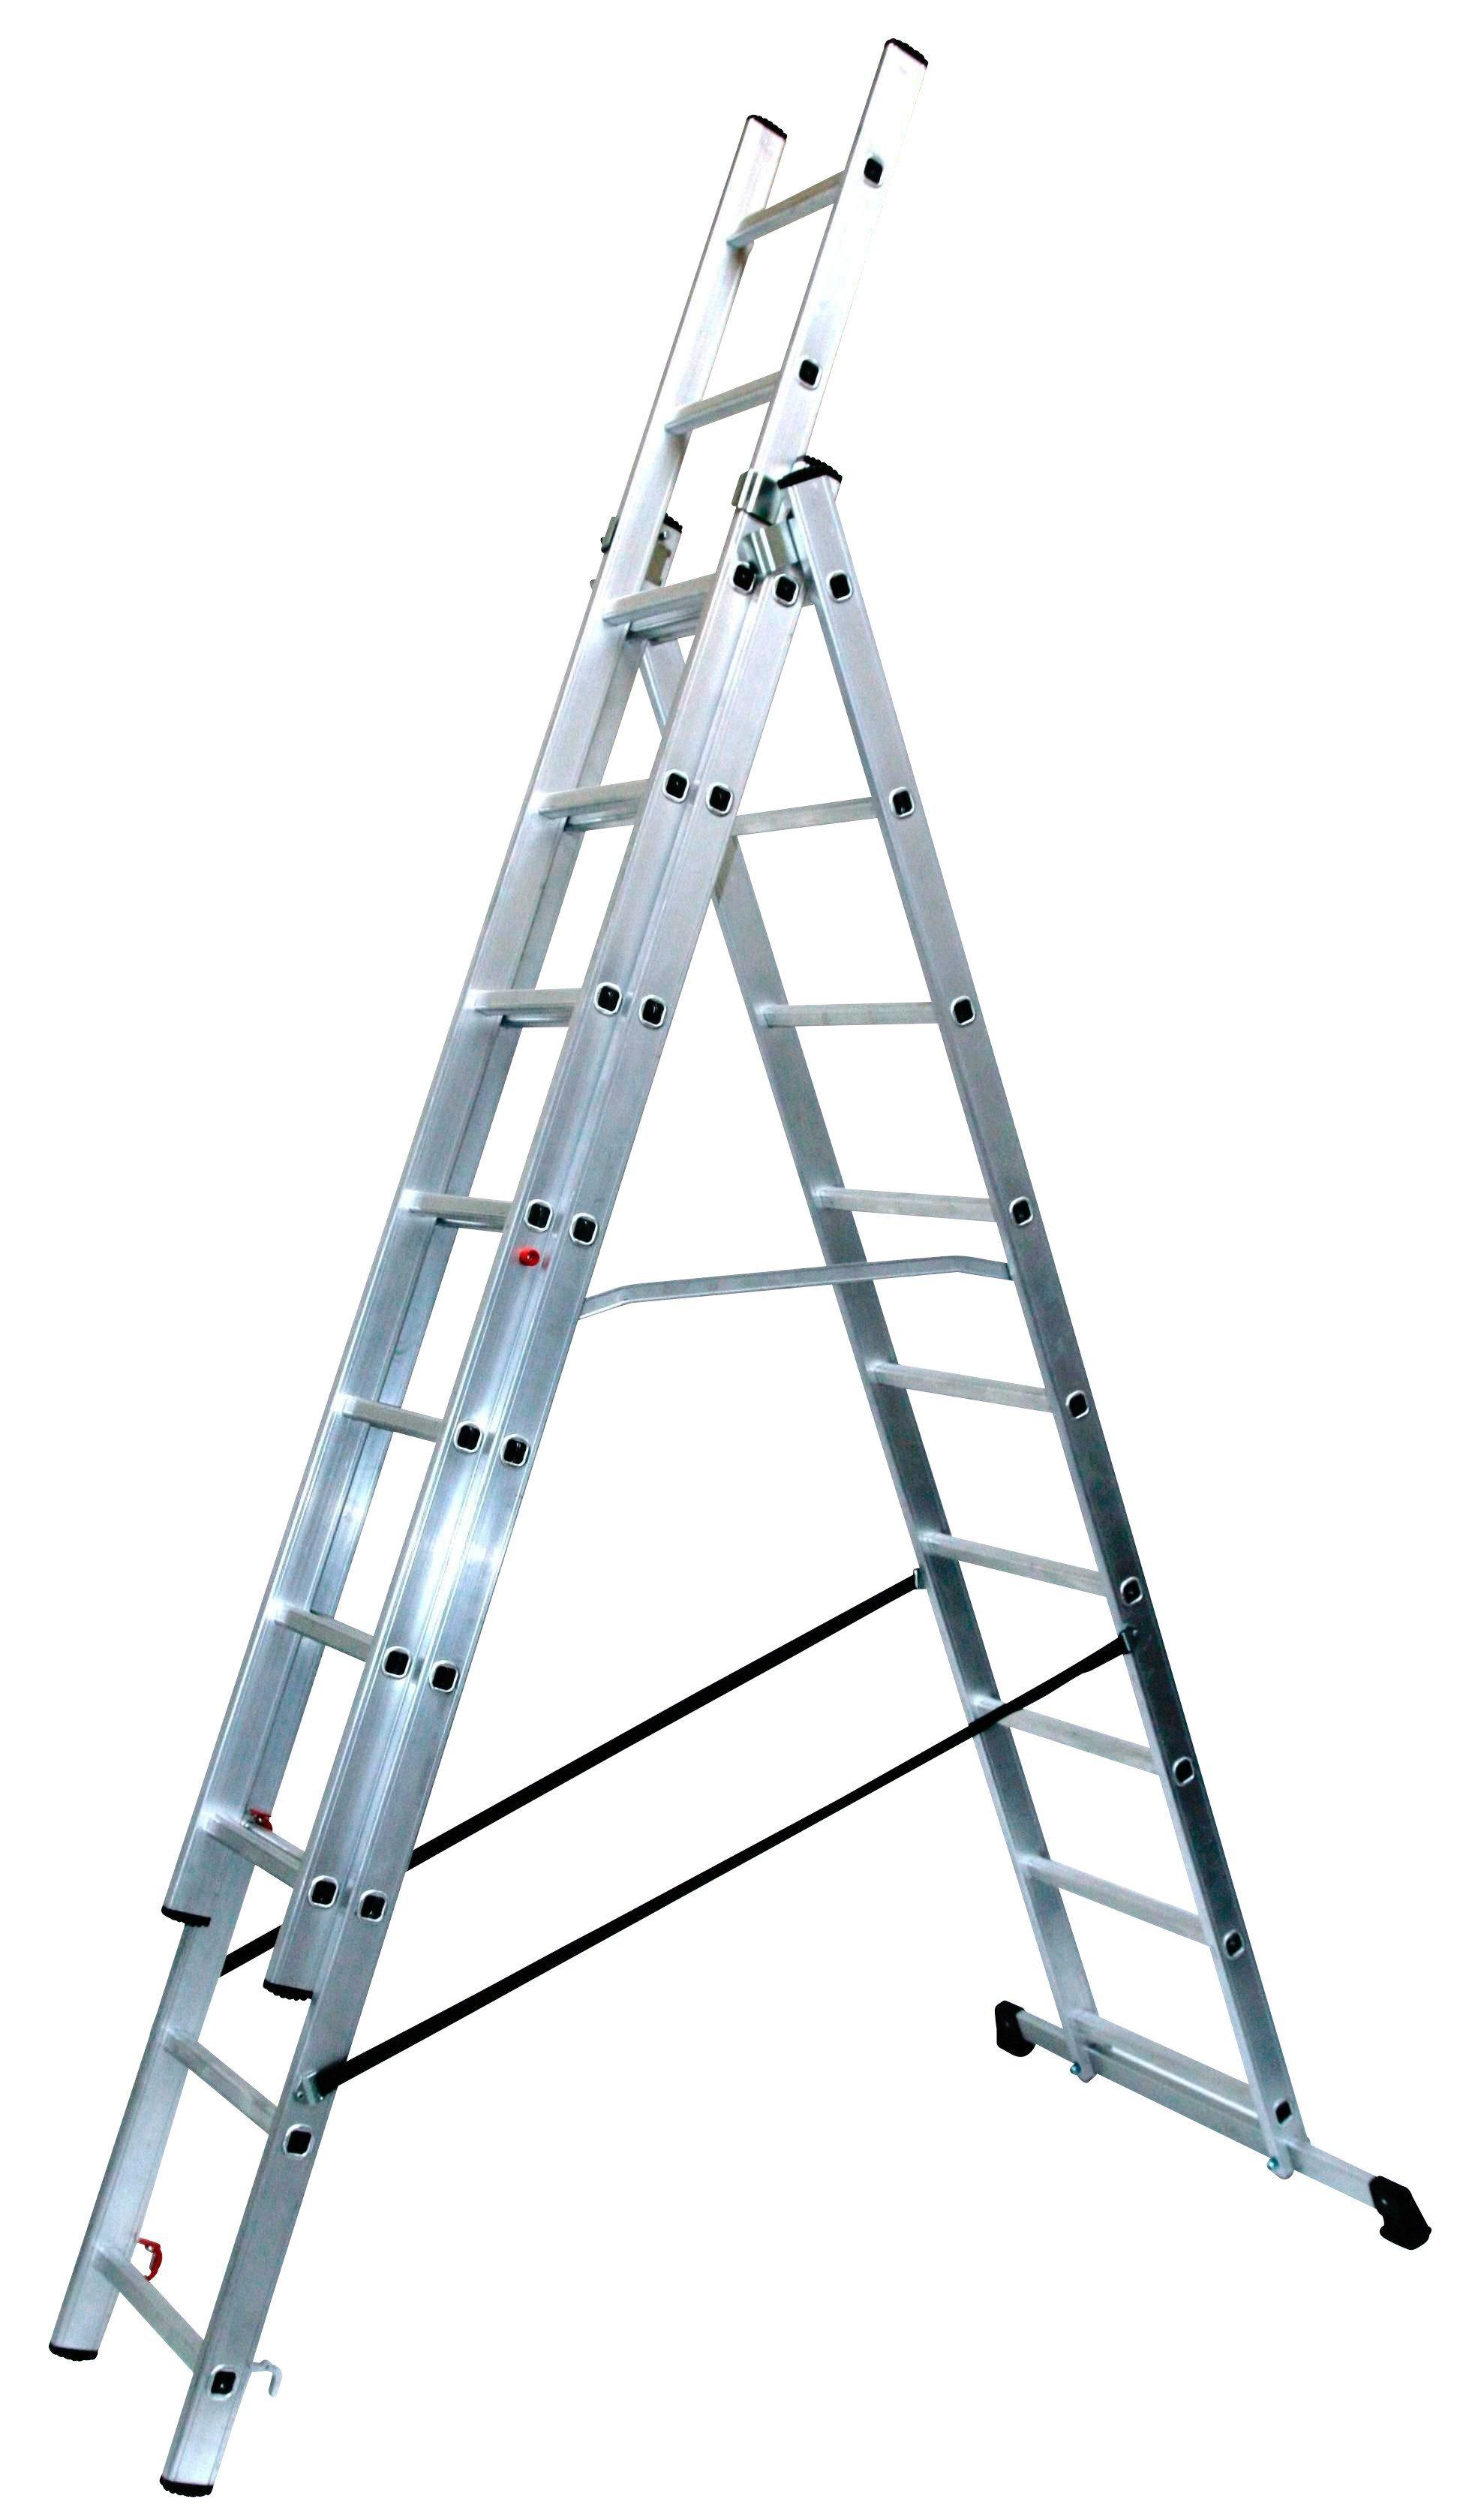 SZ METALL Alu-Schiebeleiter »9 x 3 Sprossen« | Baumarkt > Leitern und Treppen > Schiebeleiter | SZ Metall